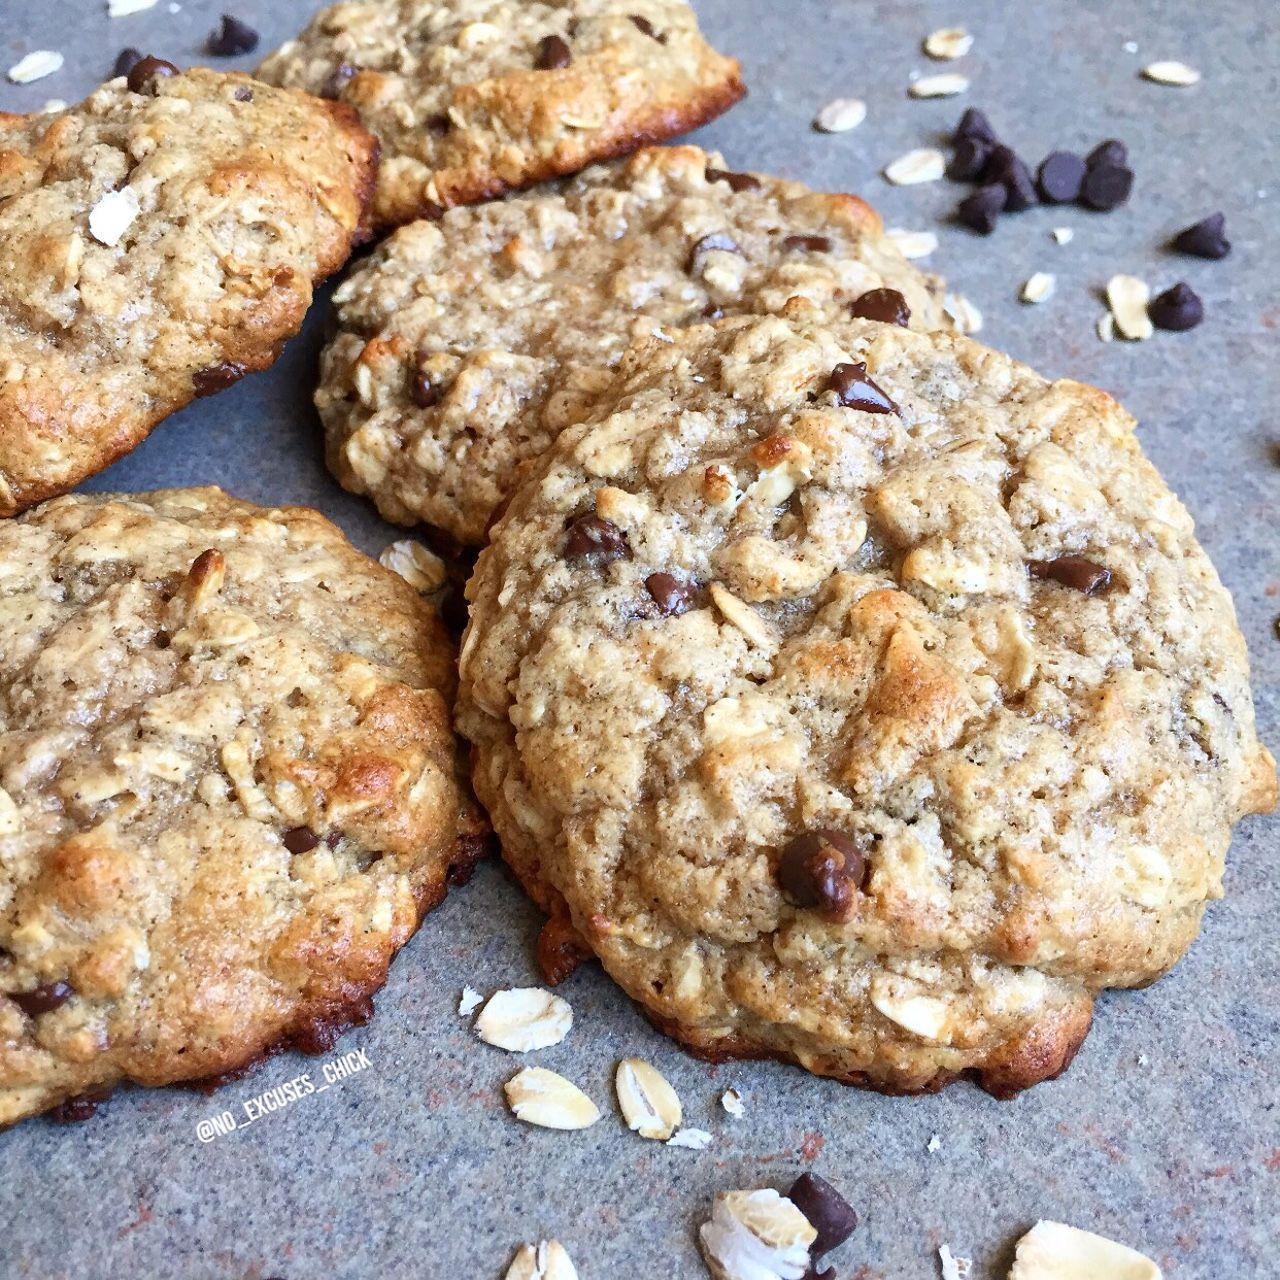 Kodiak Cakes Chocolate Chip Oatmeal Cookie Recipe